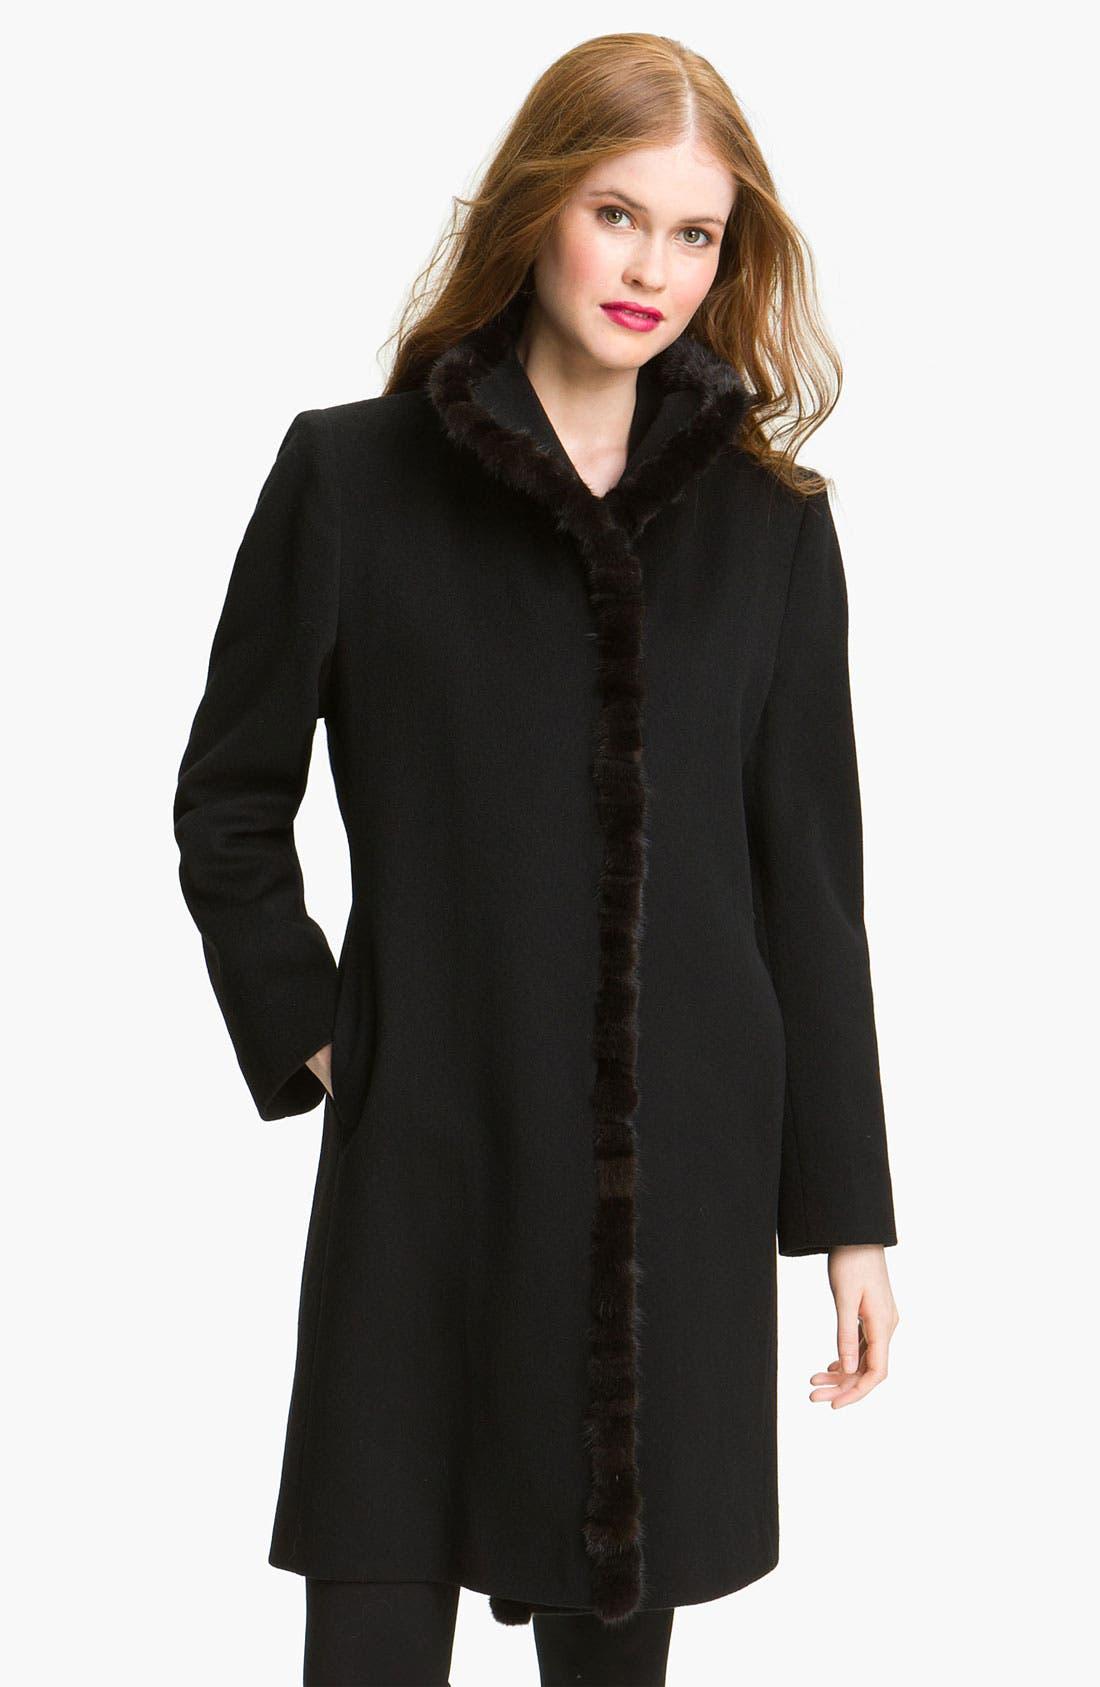 Main Image - Fleurette Loro Piana Wool Coat with Genuine Mink Fur